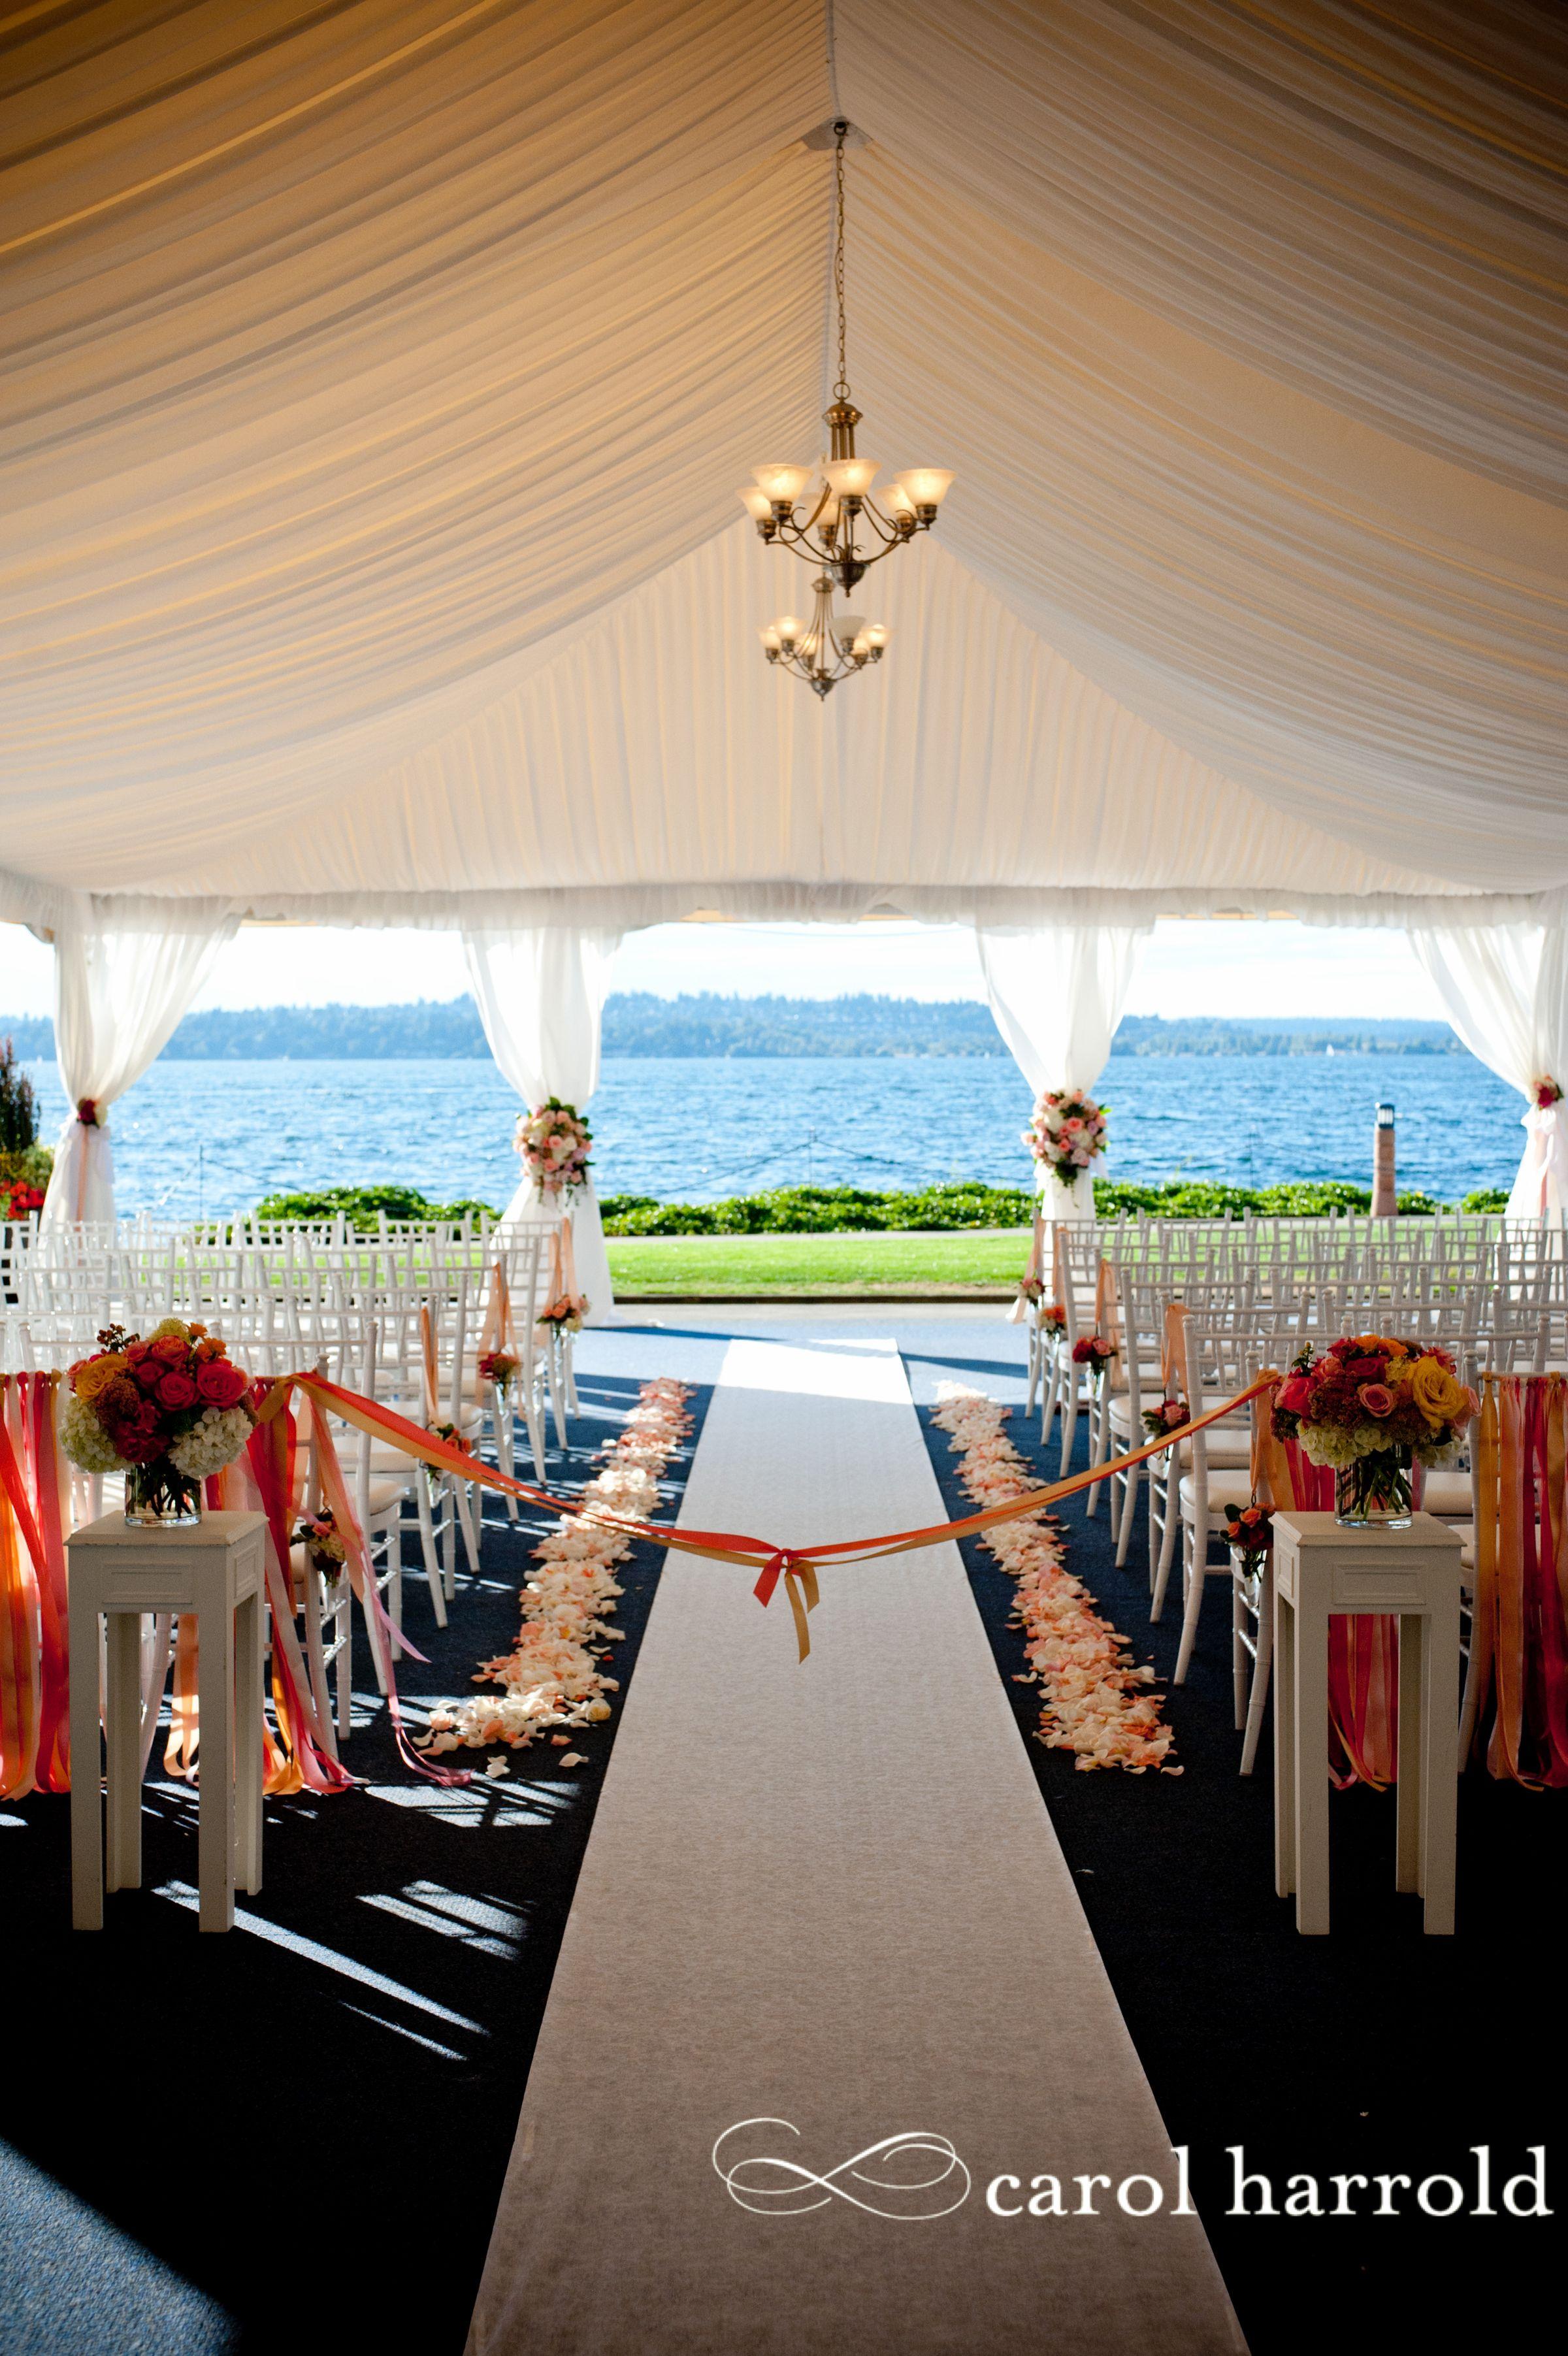 seattle area wedding venue on lake washington woodmark hotel destination weddings. Black Bedroom Furniture Sets. Home Design Ideas